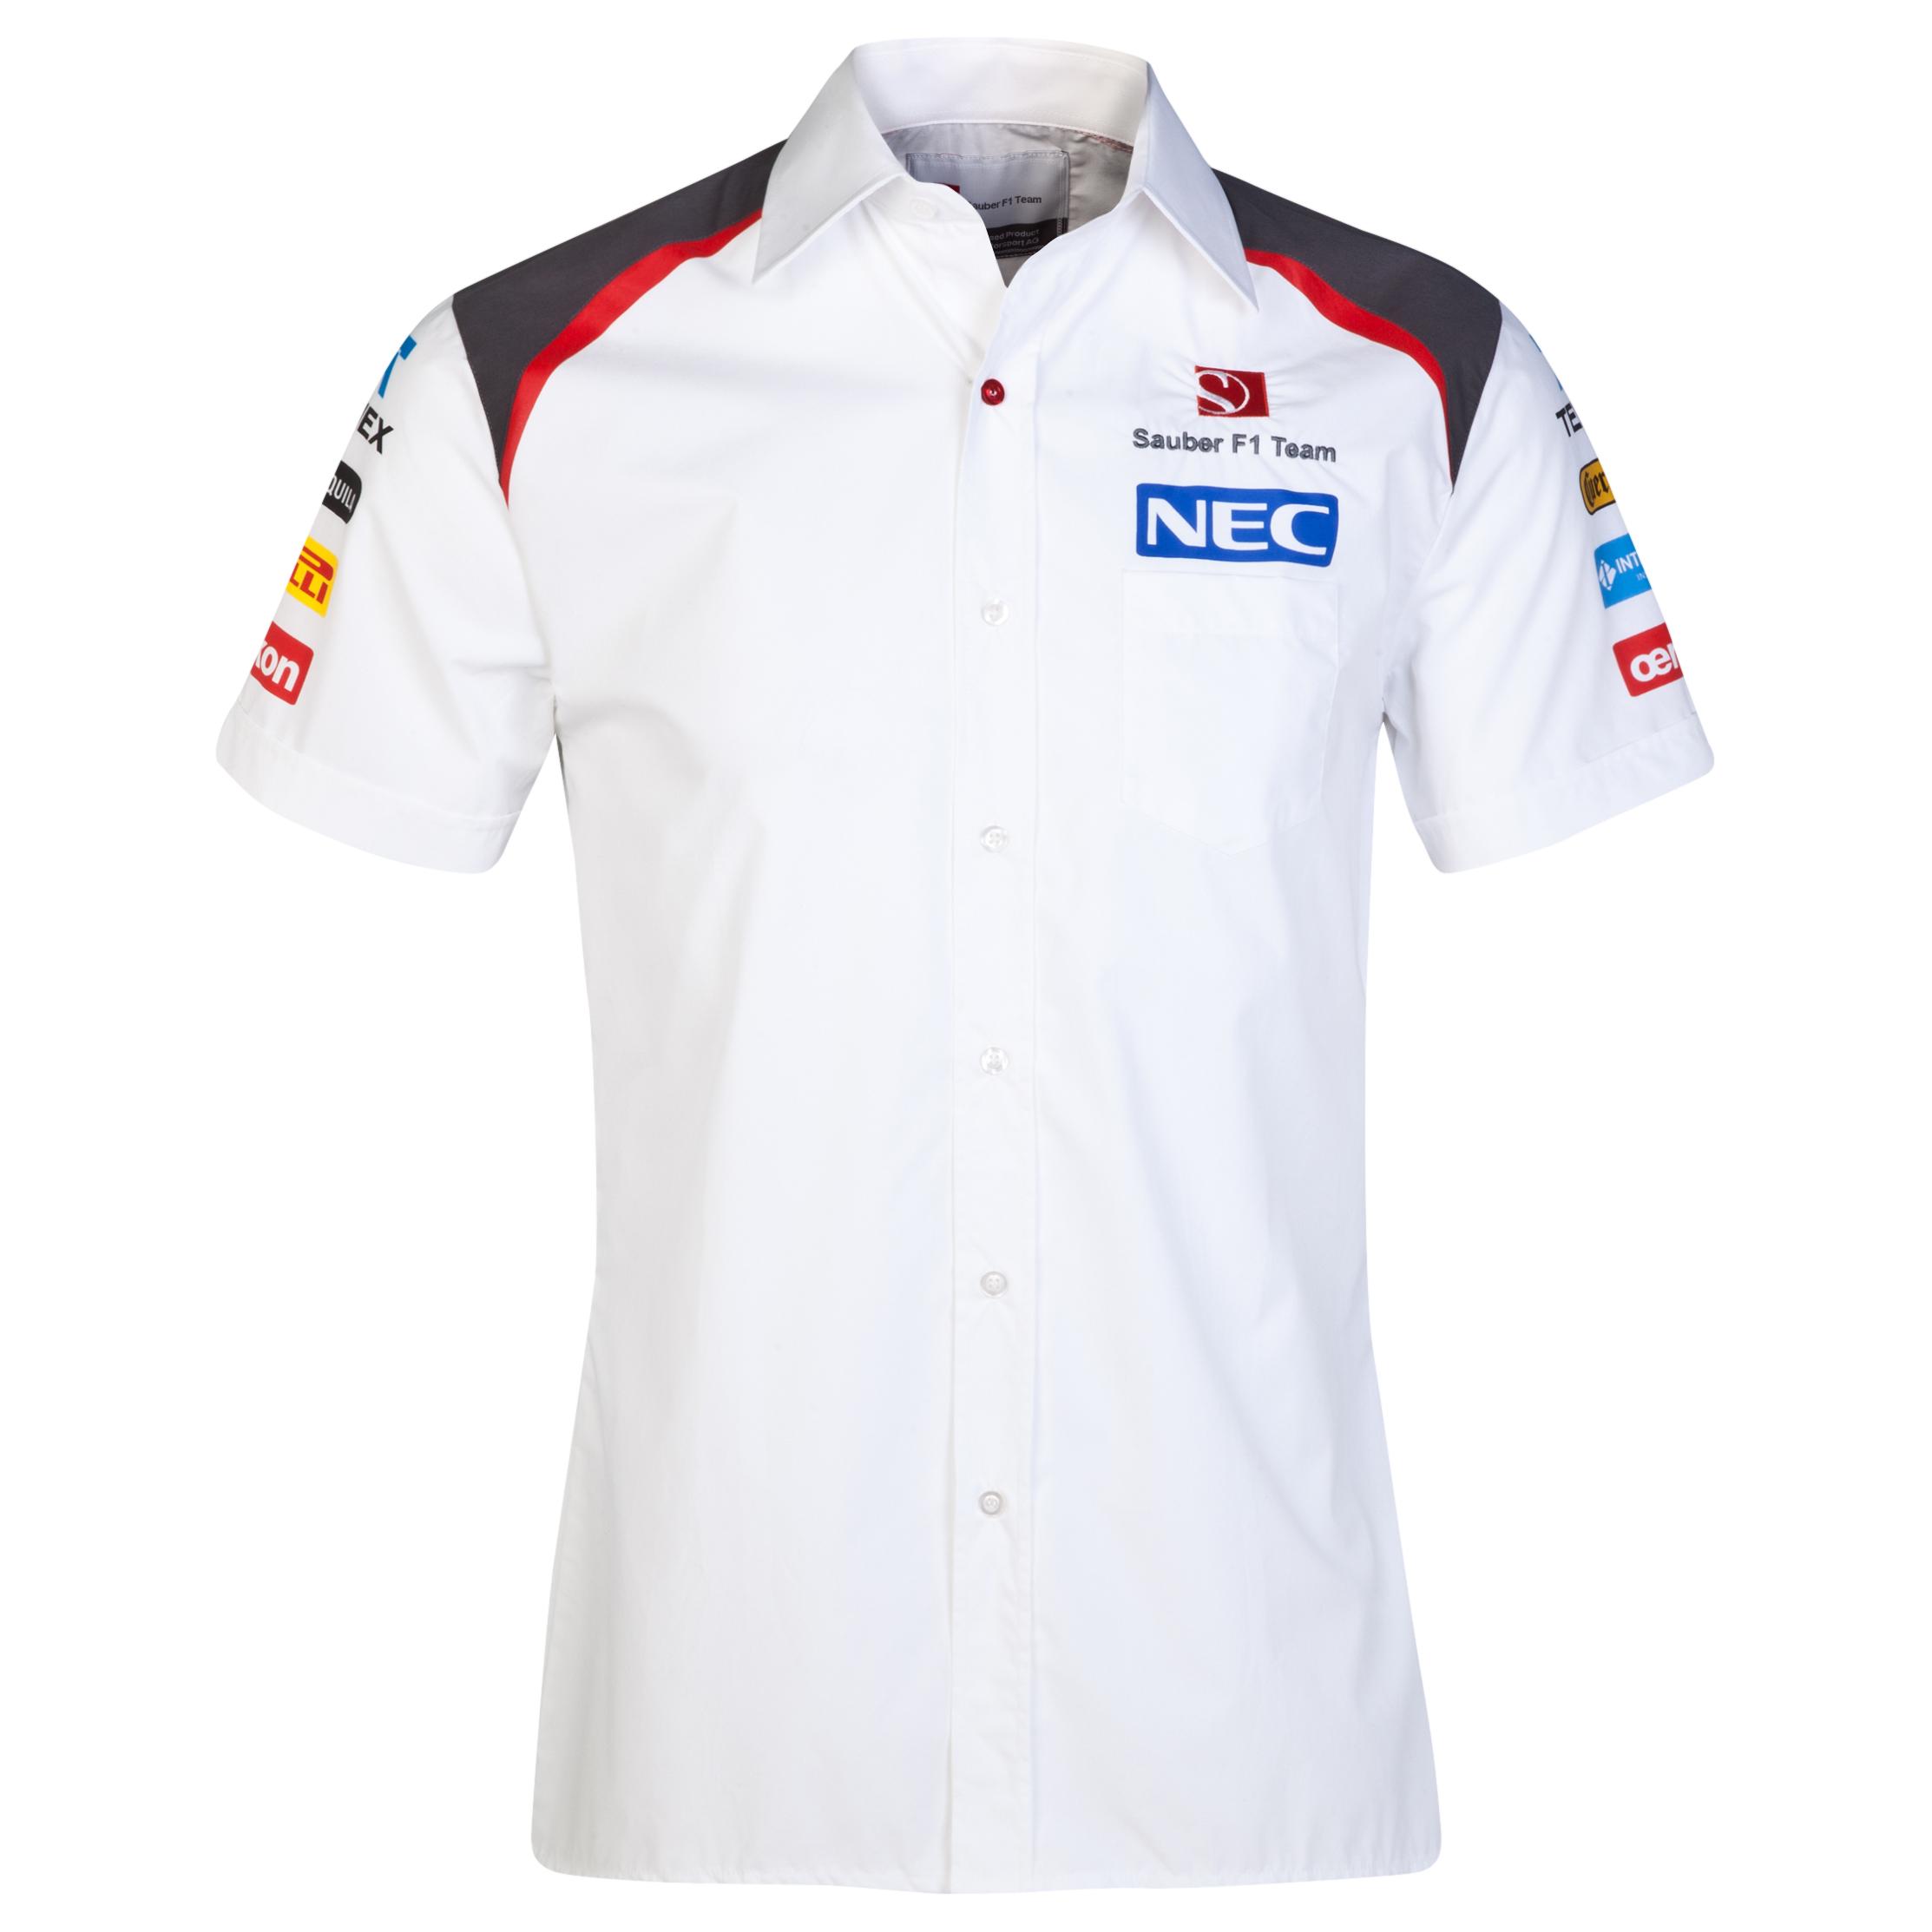 SAUBER F1 Team Sponsor Shirt